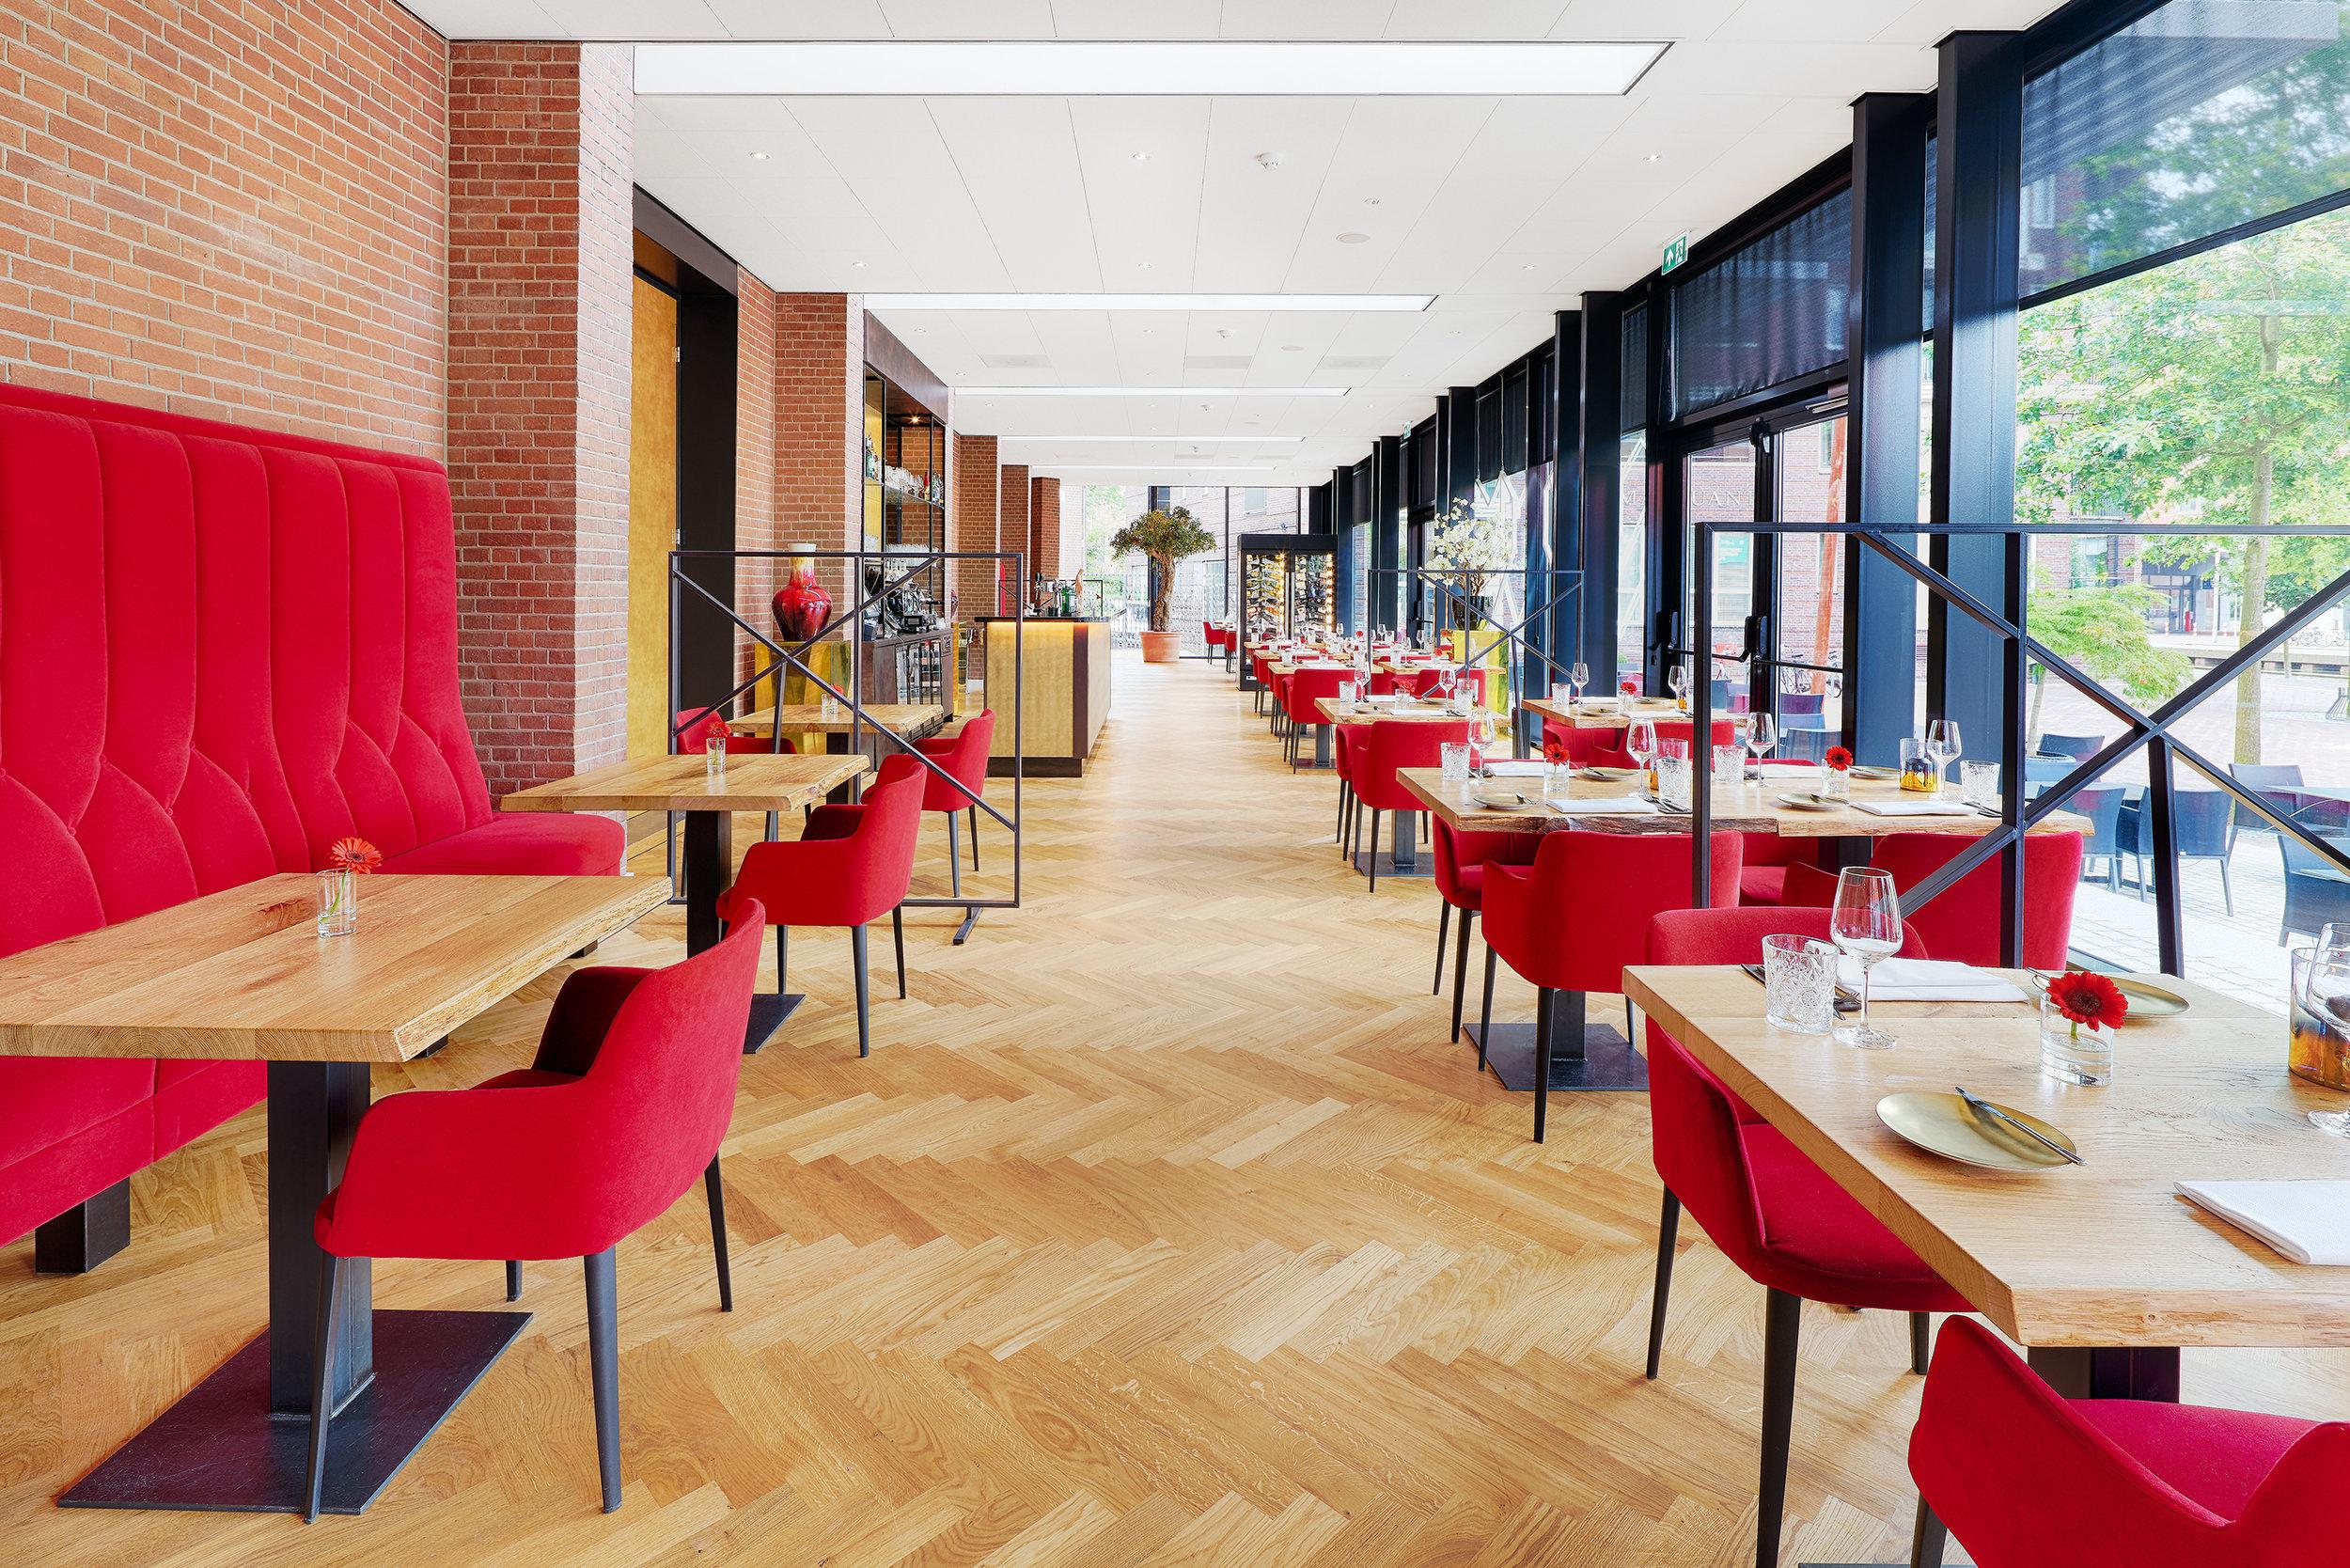 rolg restaurant-liefdegesticht-2.jpg